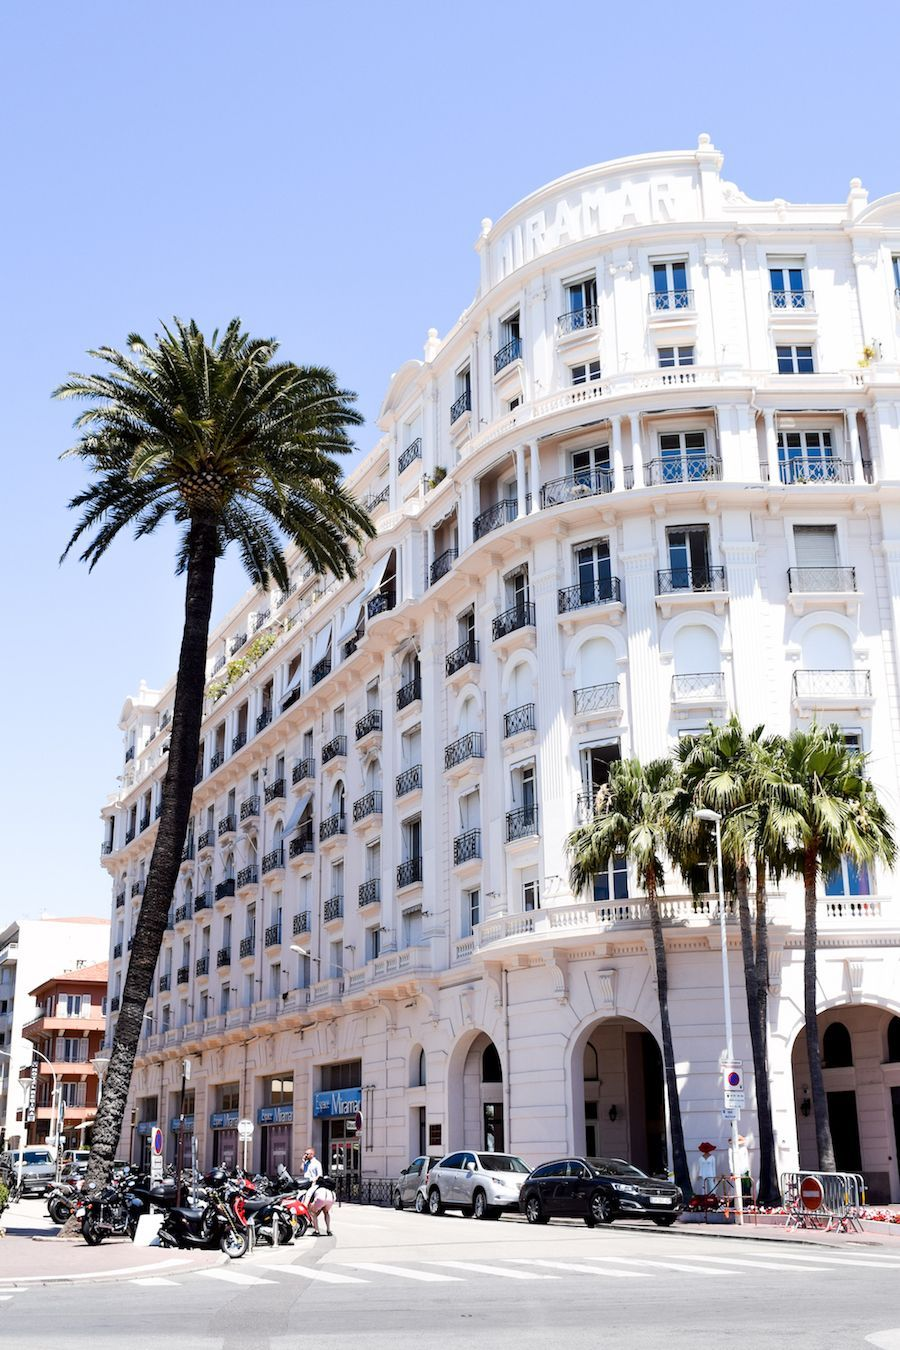 Miramar, Cannes, France